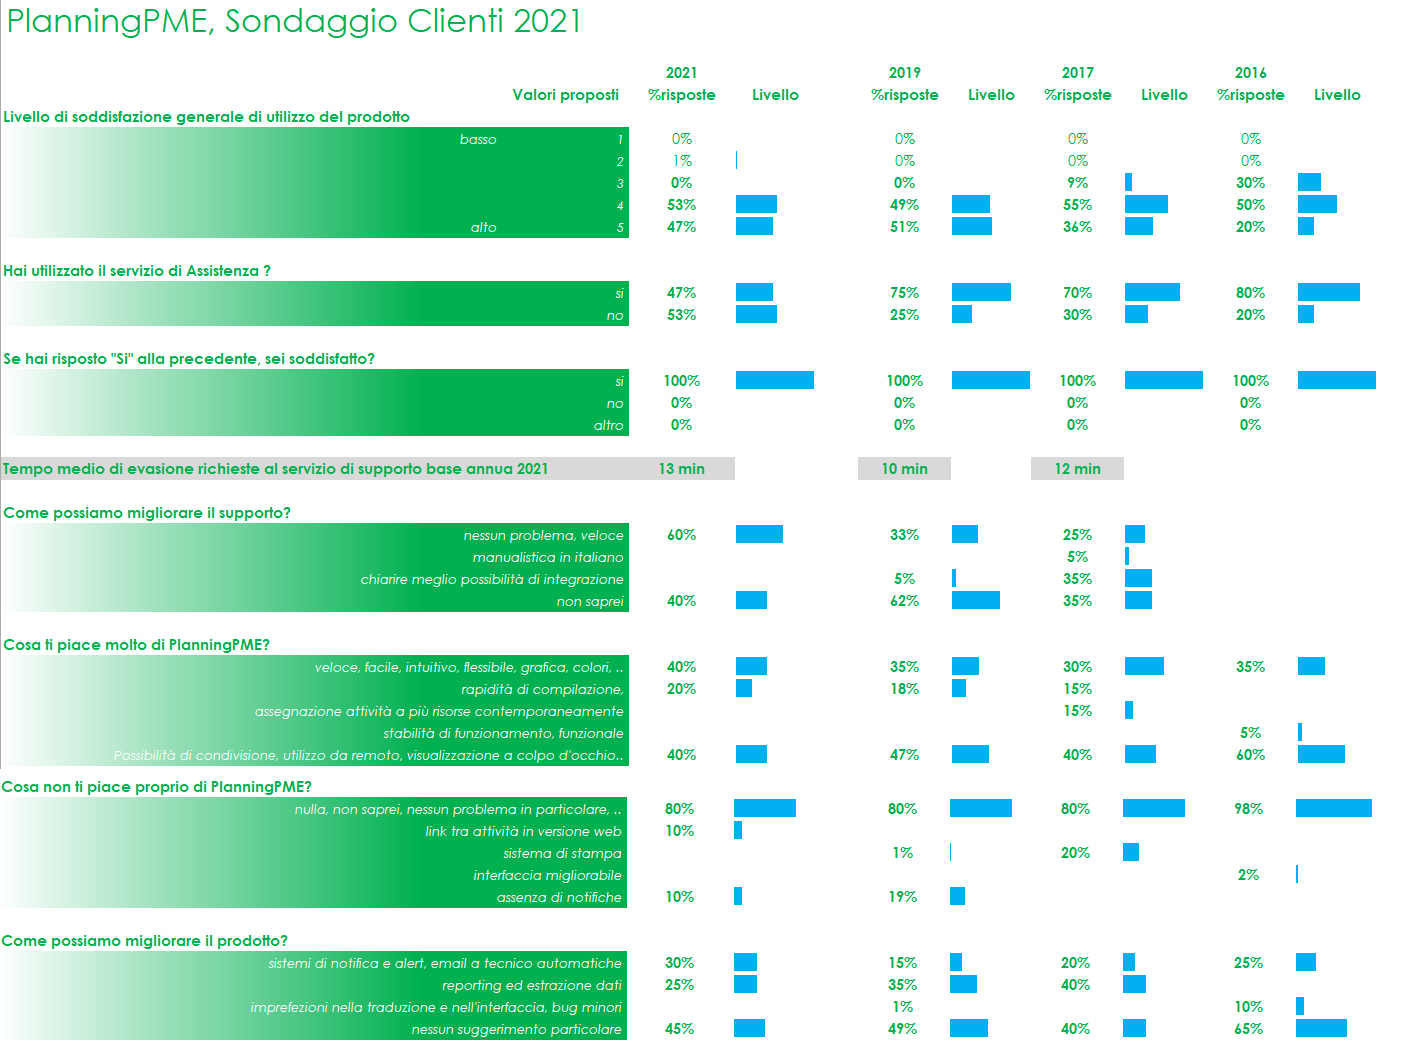 Sondaggio Clienti PlanningPME 2021